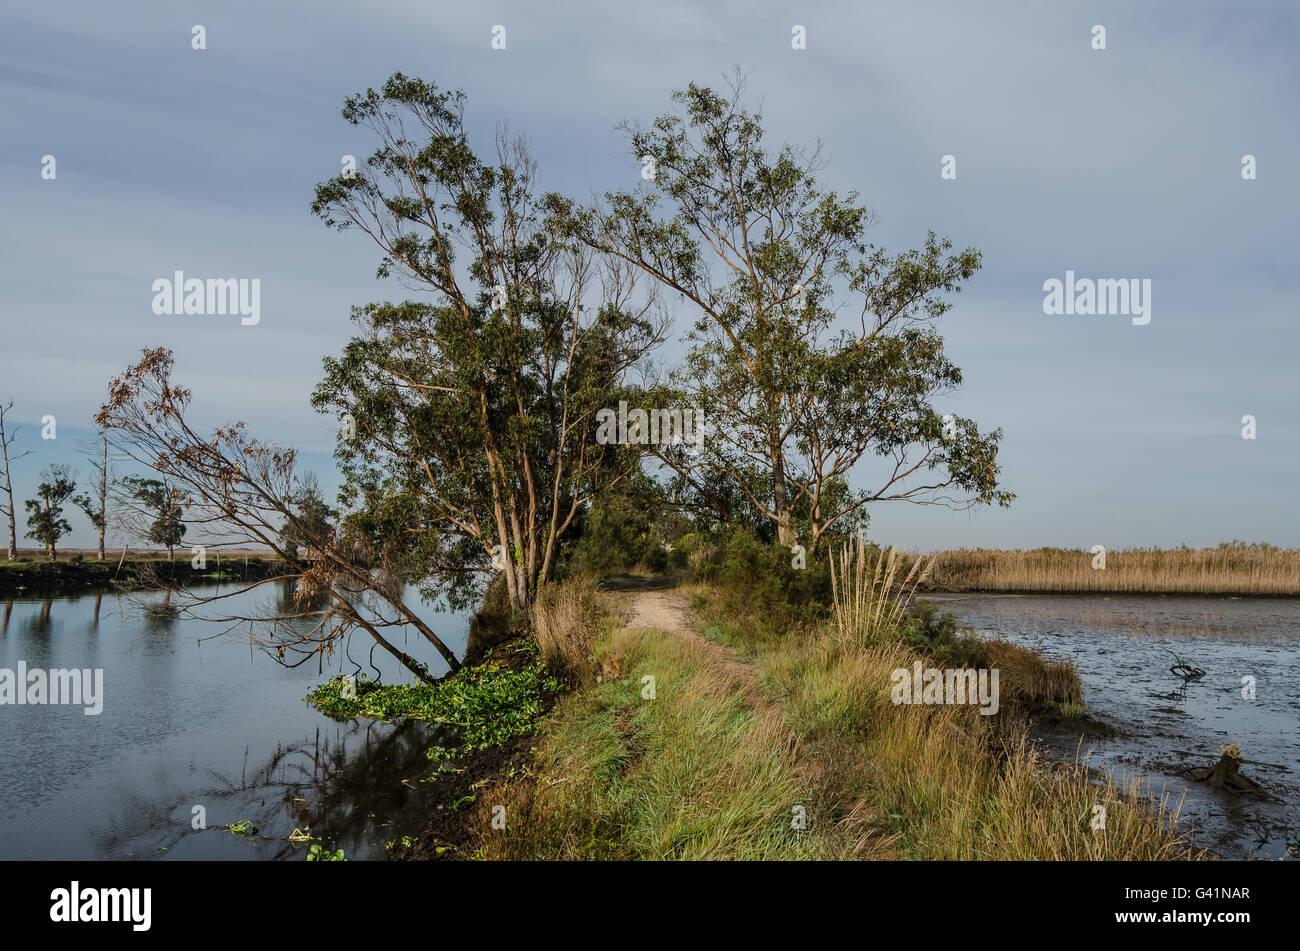 Eucalyptus trees - Stock Image